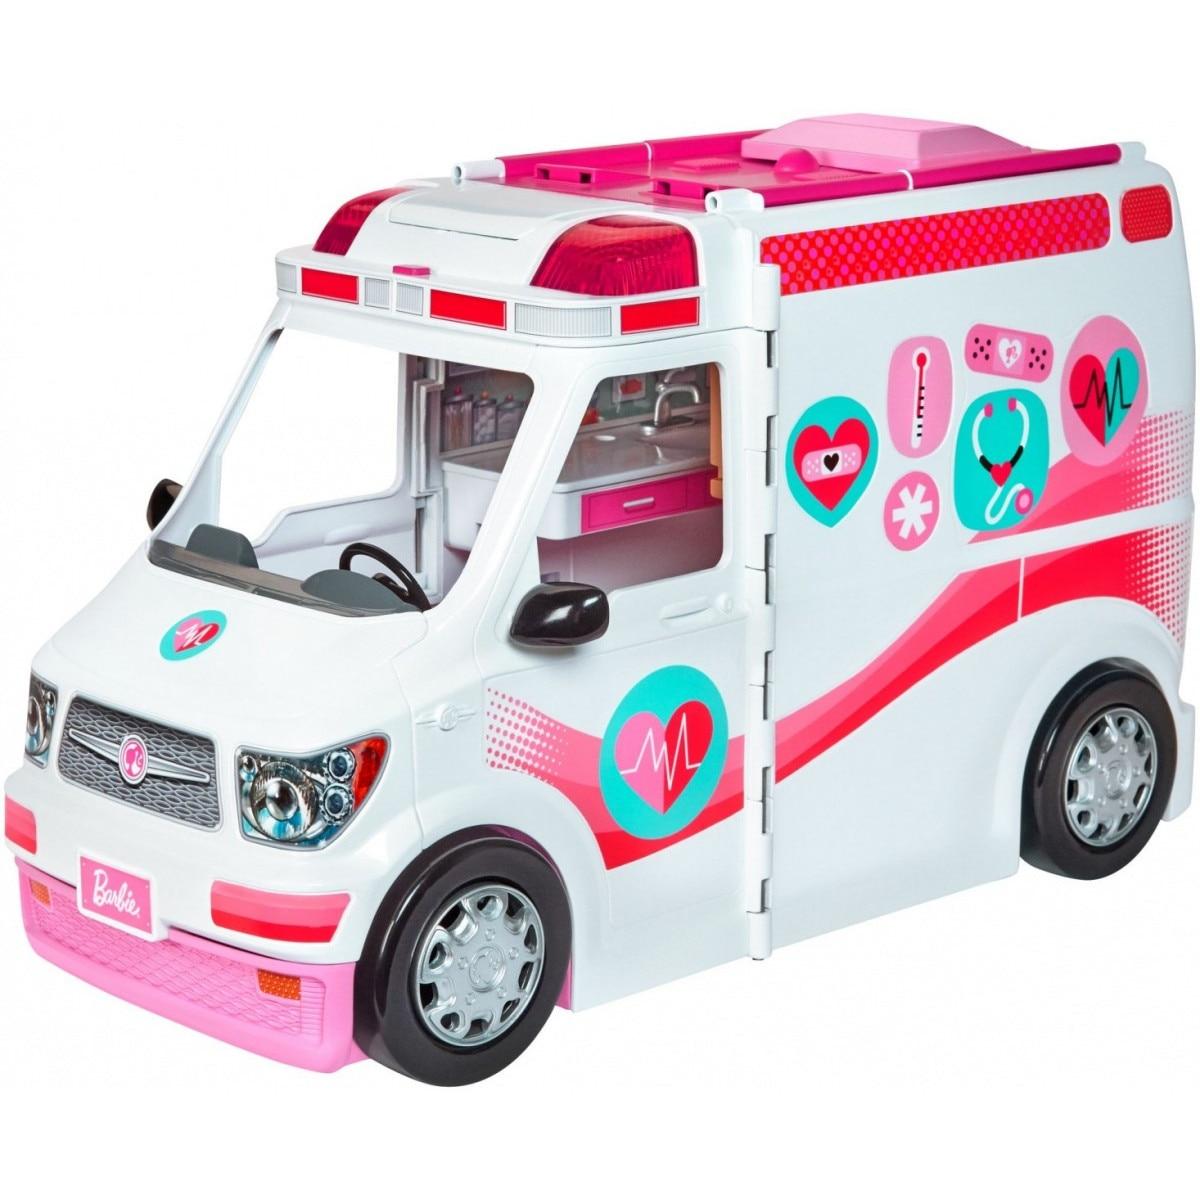 Barbie Auto Es Jatek Baba Egy Csomagban Mattel Emag Hu